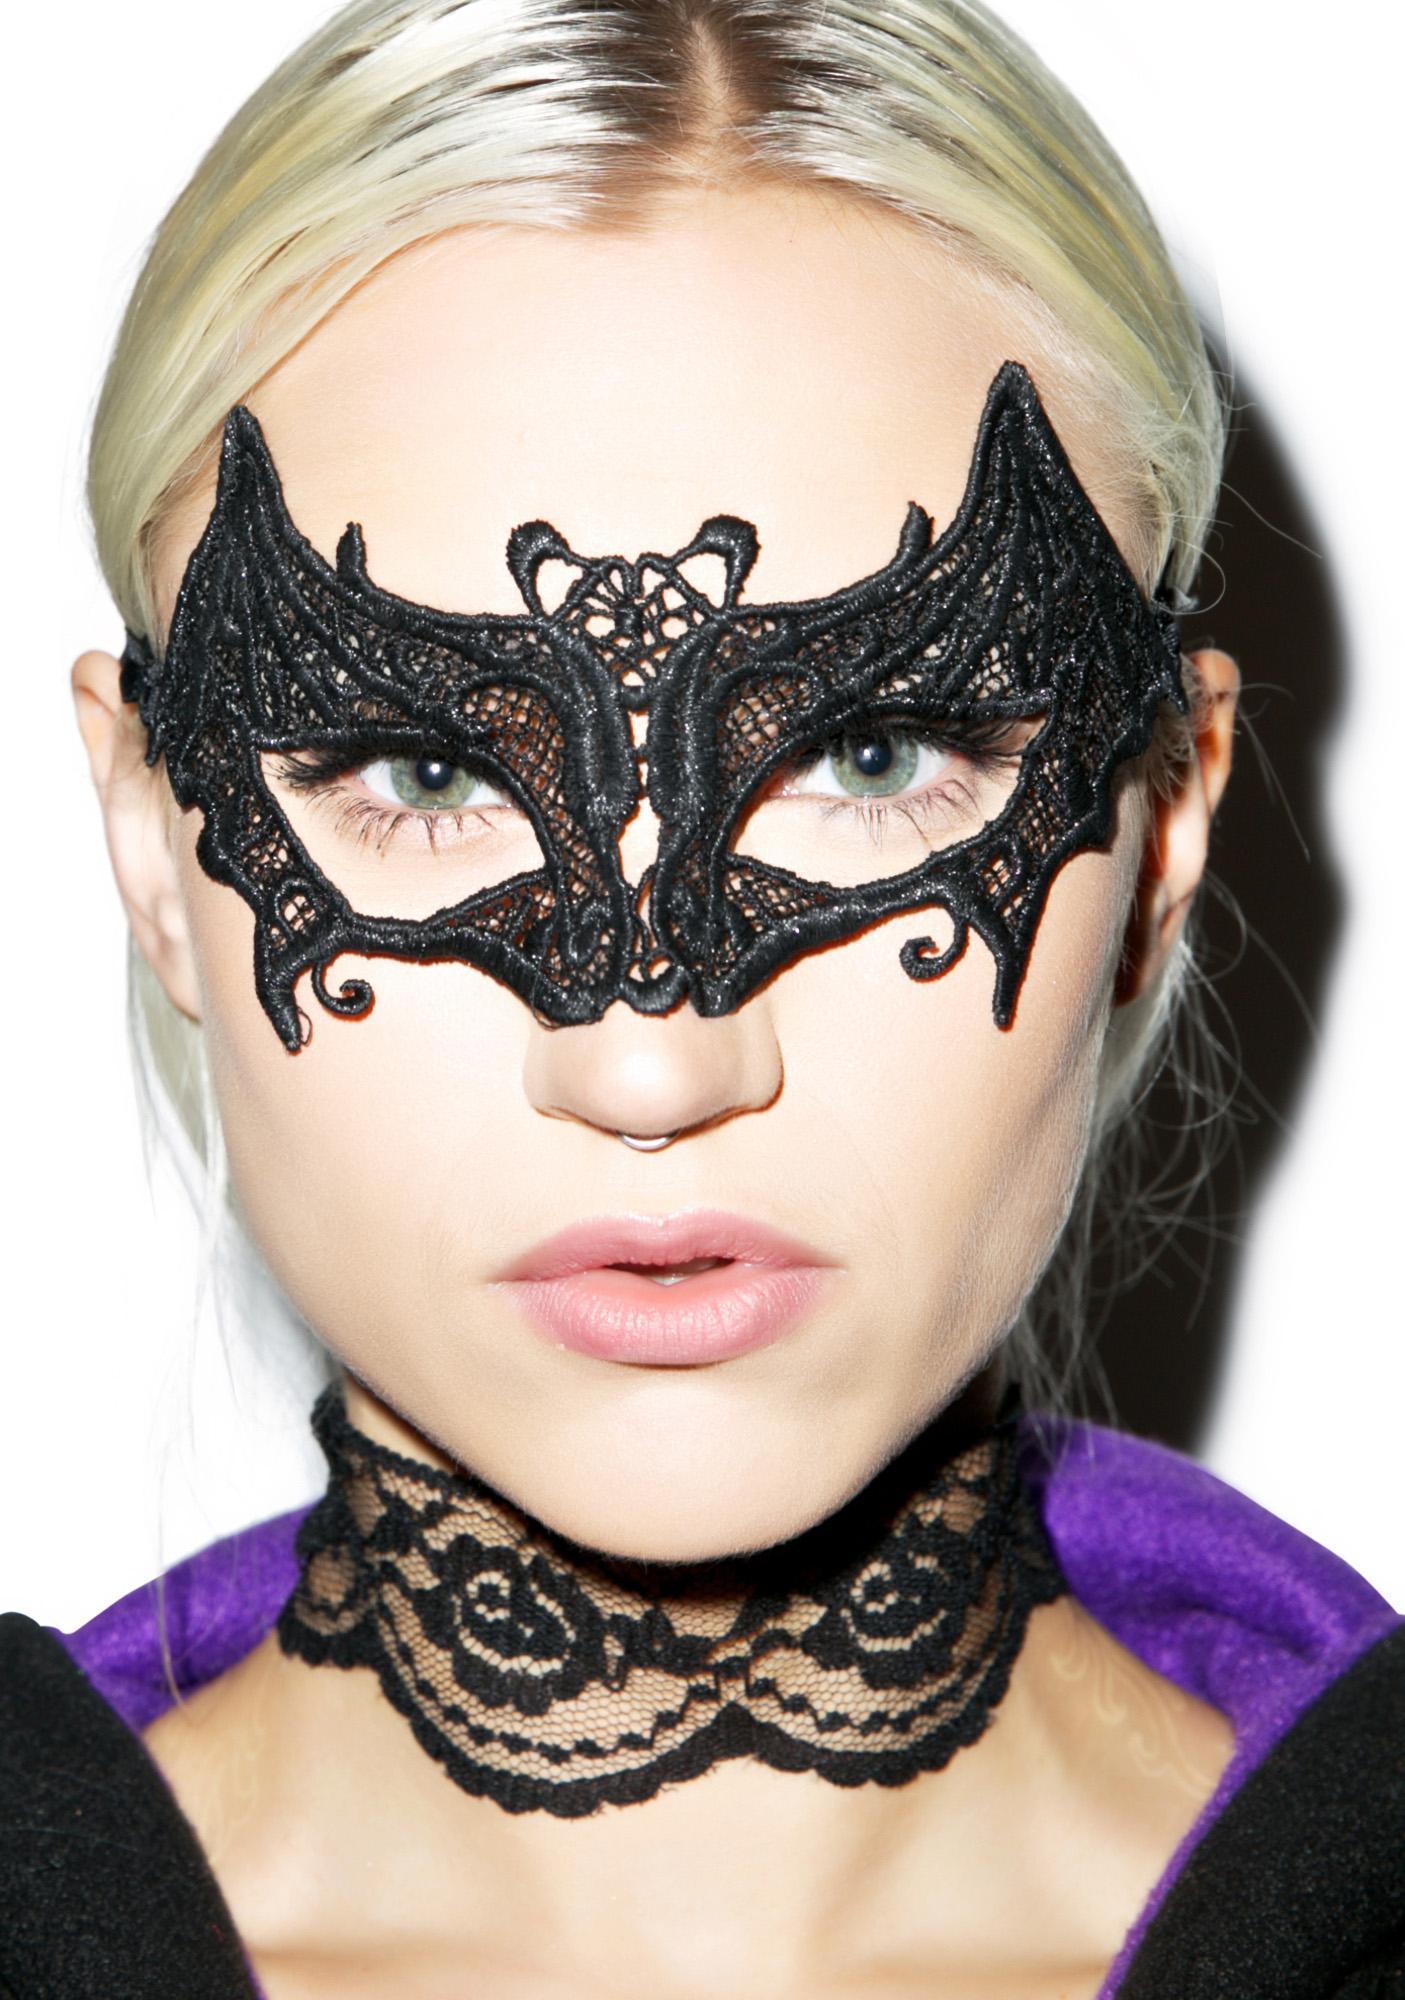 Batty Babe Eye Mask